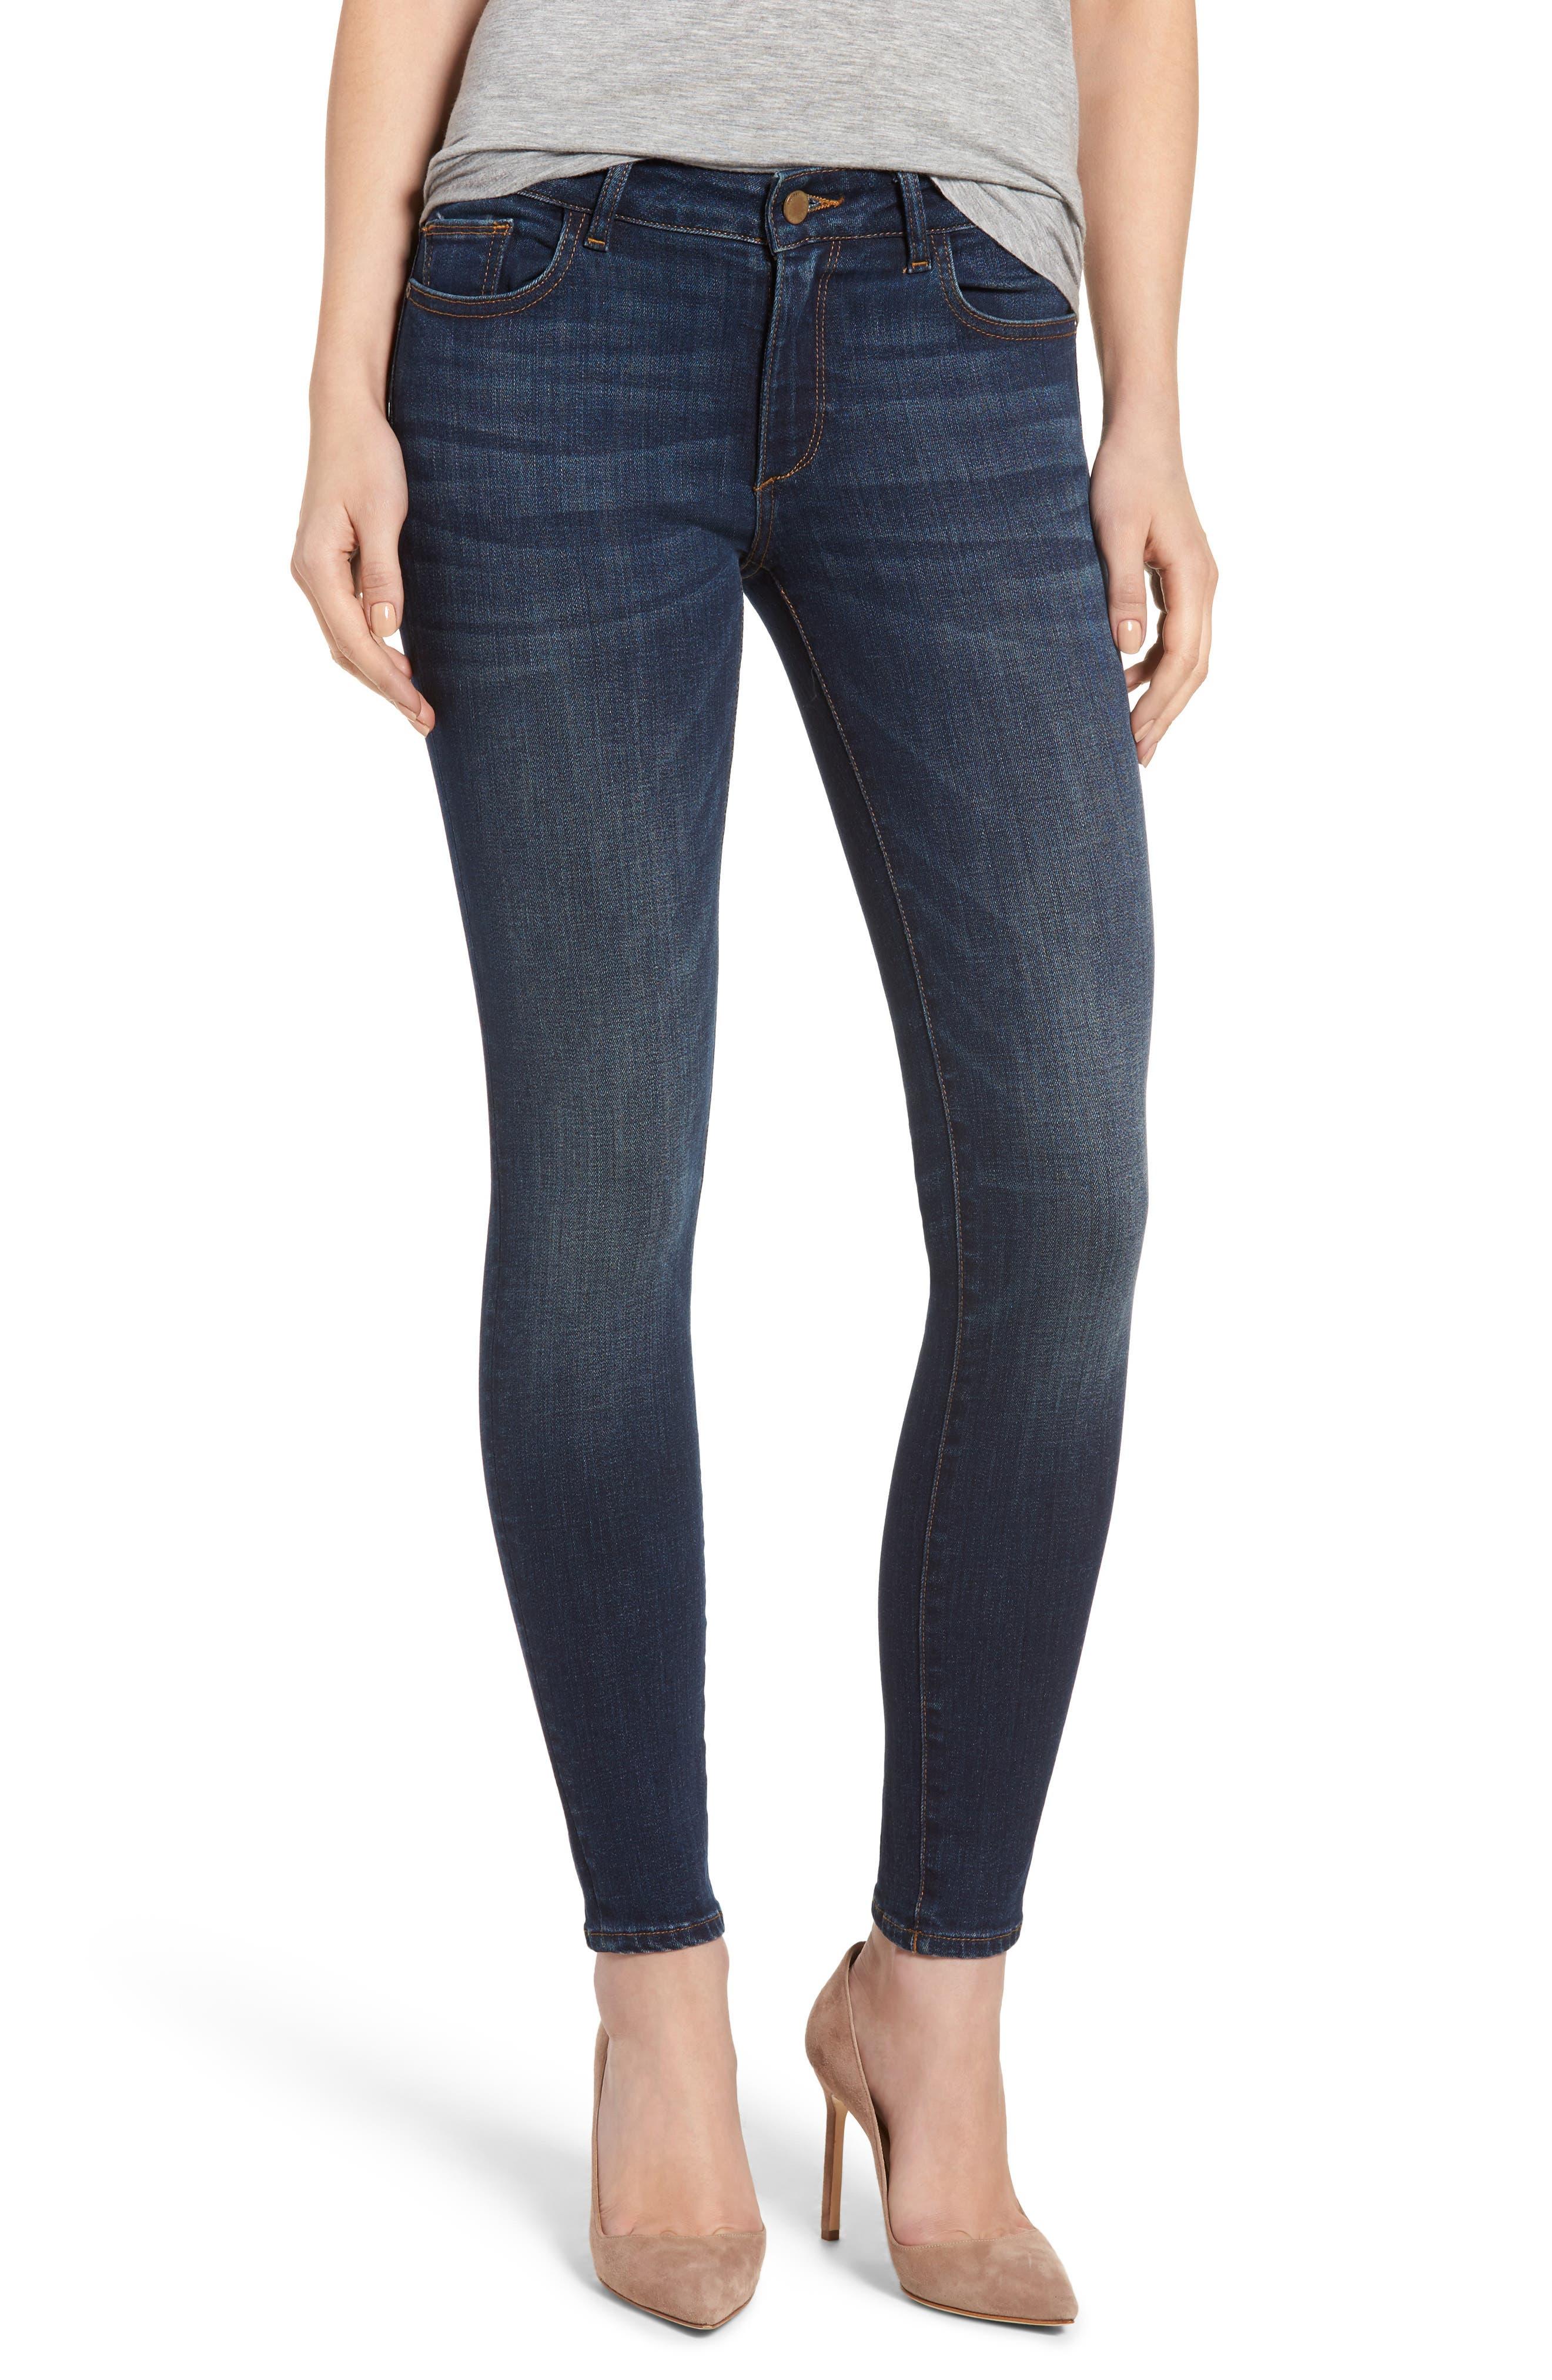 Emma Power Legging Skinny Jeans,                             Main thumbnail 1, color,                             Sulton